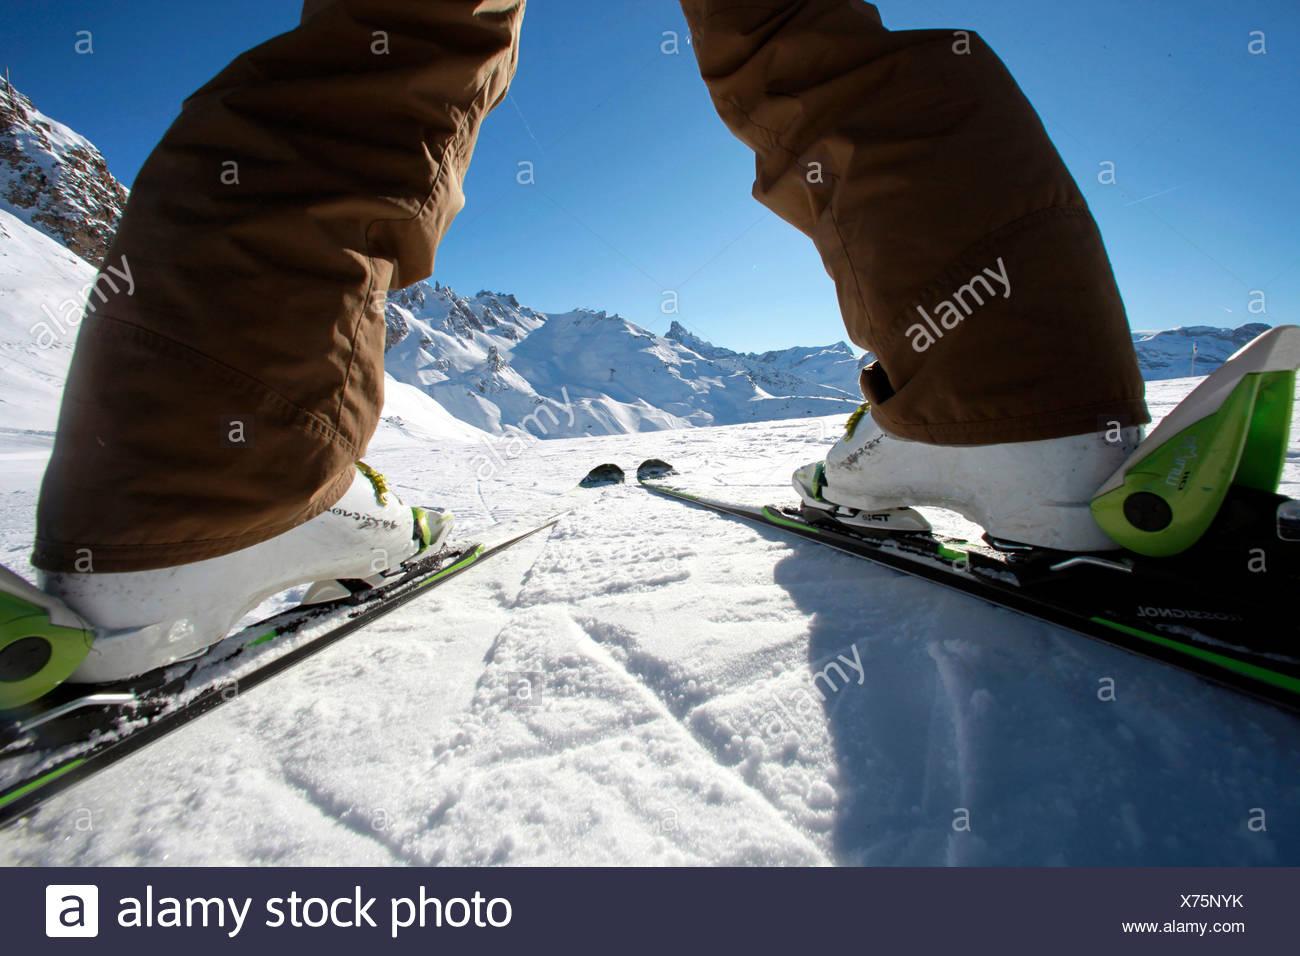 France, Alps, Savoie, Courchevel 1850, female skier - Stock Image